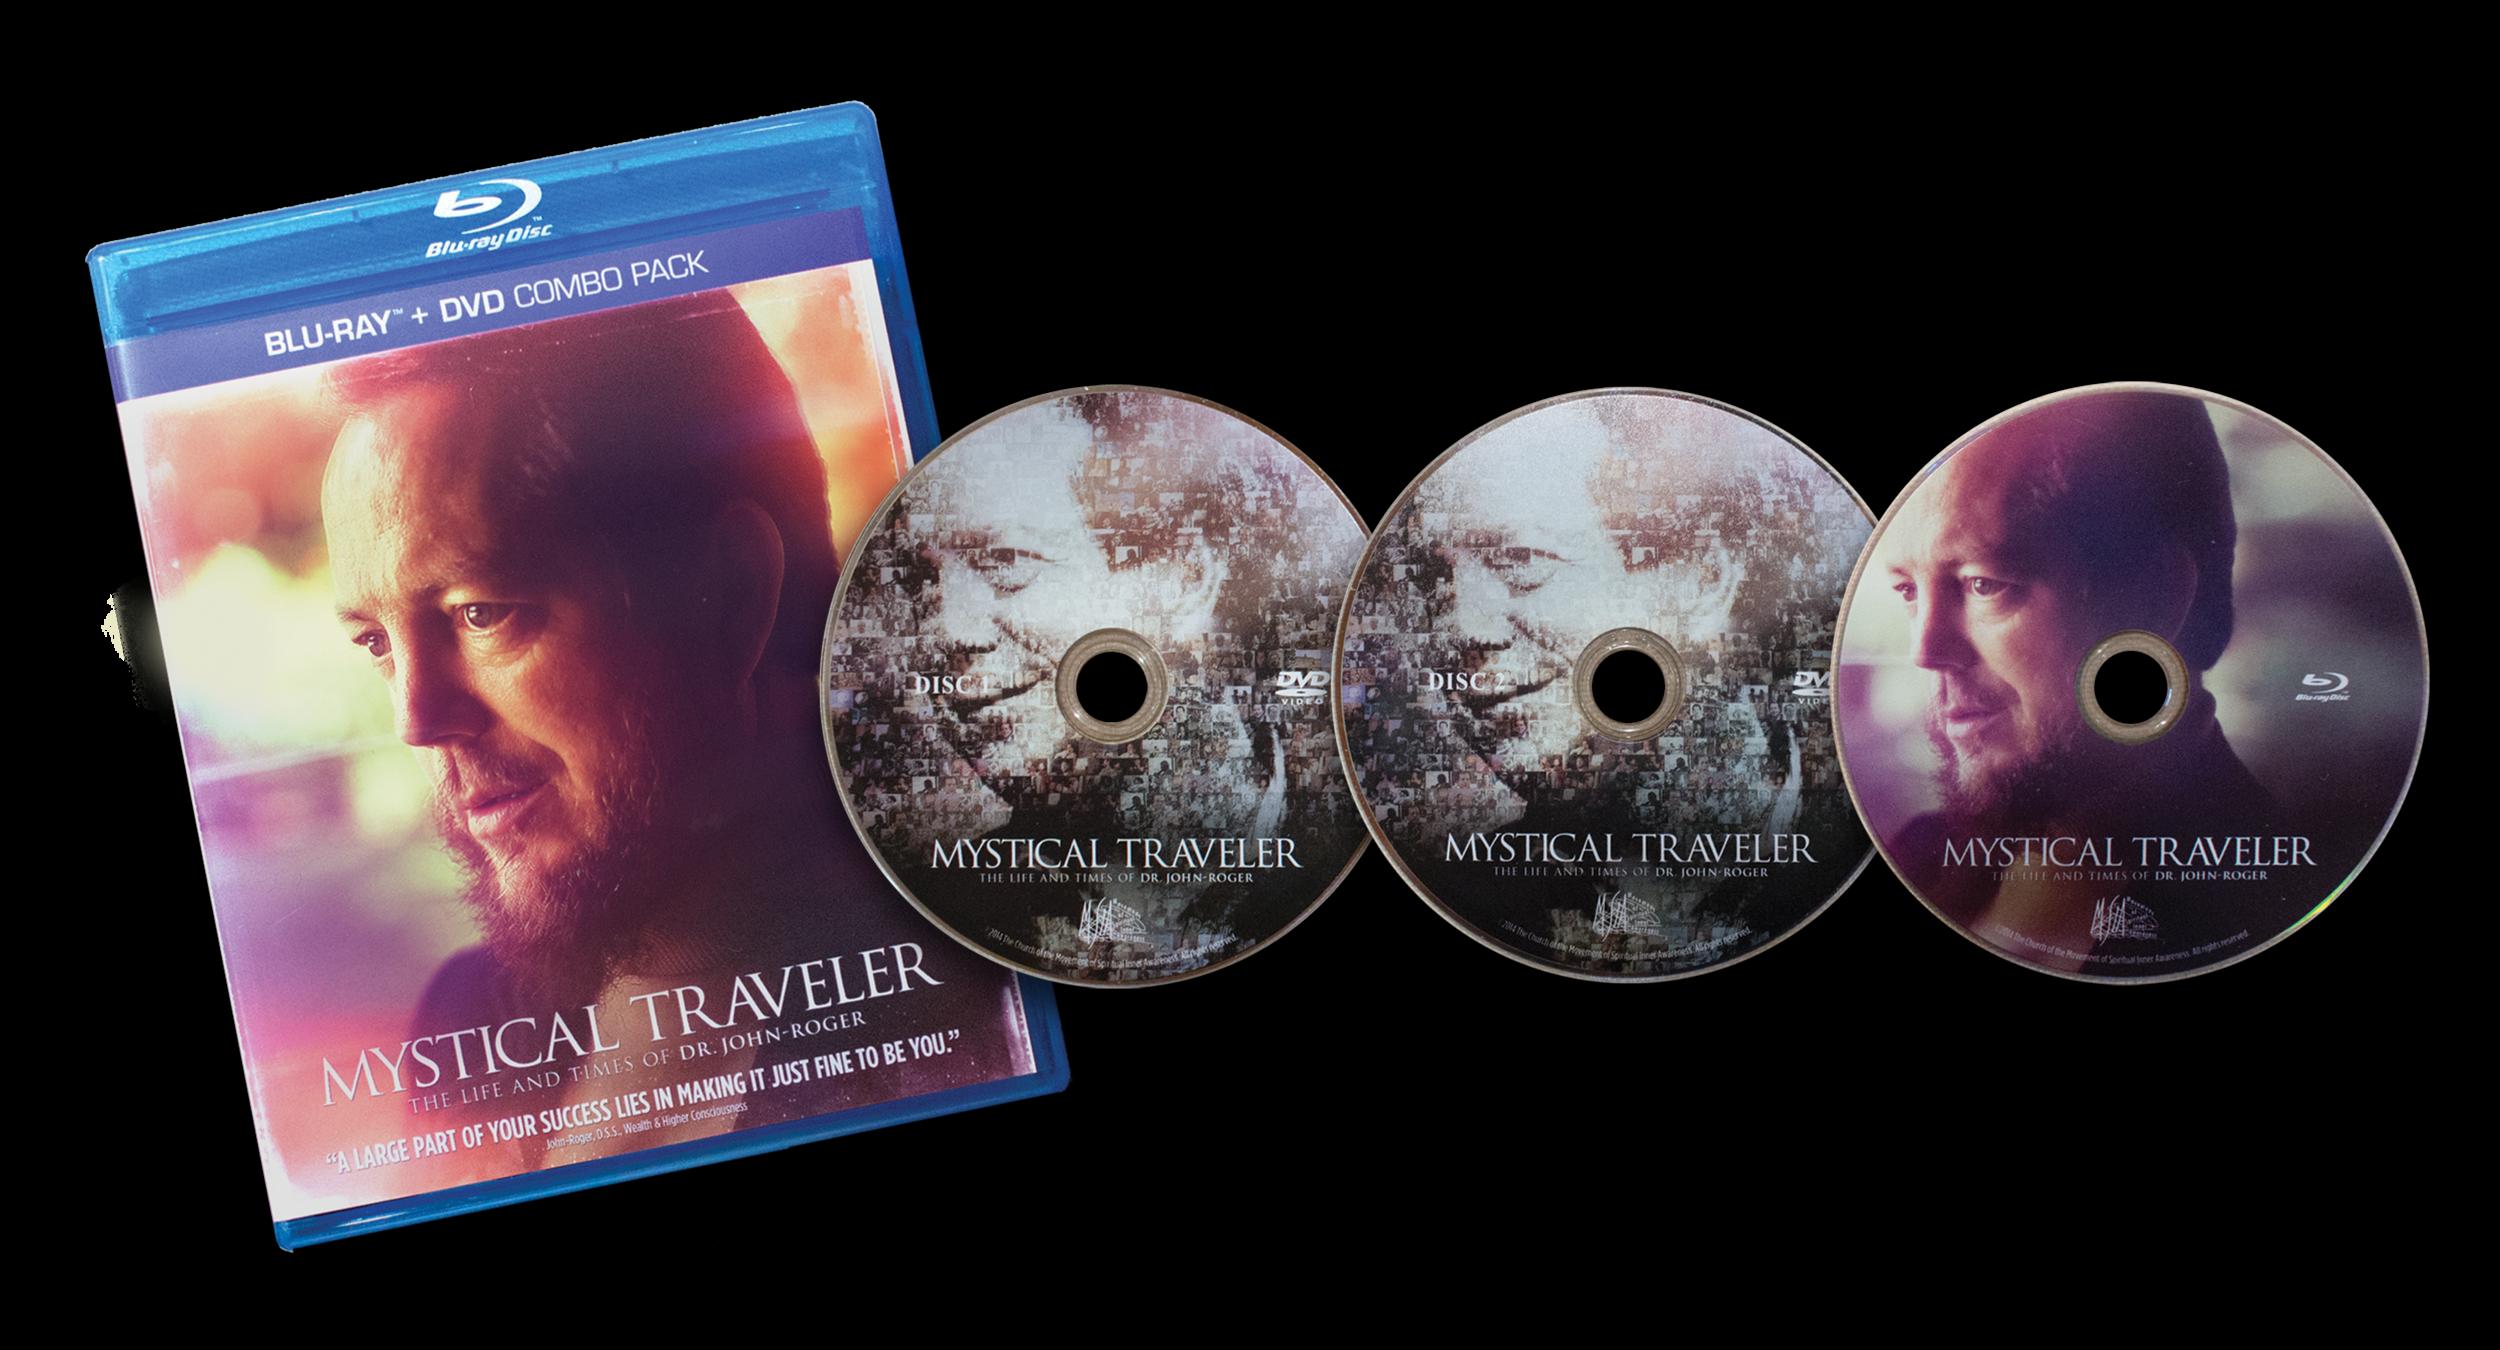 Mystical-Traveler-Blu-Ray-DVD-poster_QUAD3LL-copy.jpg